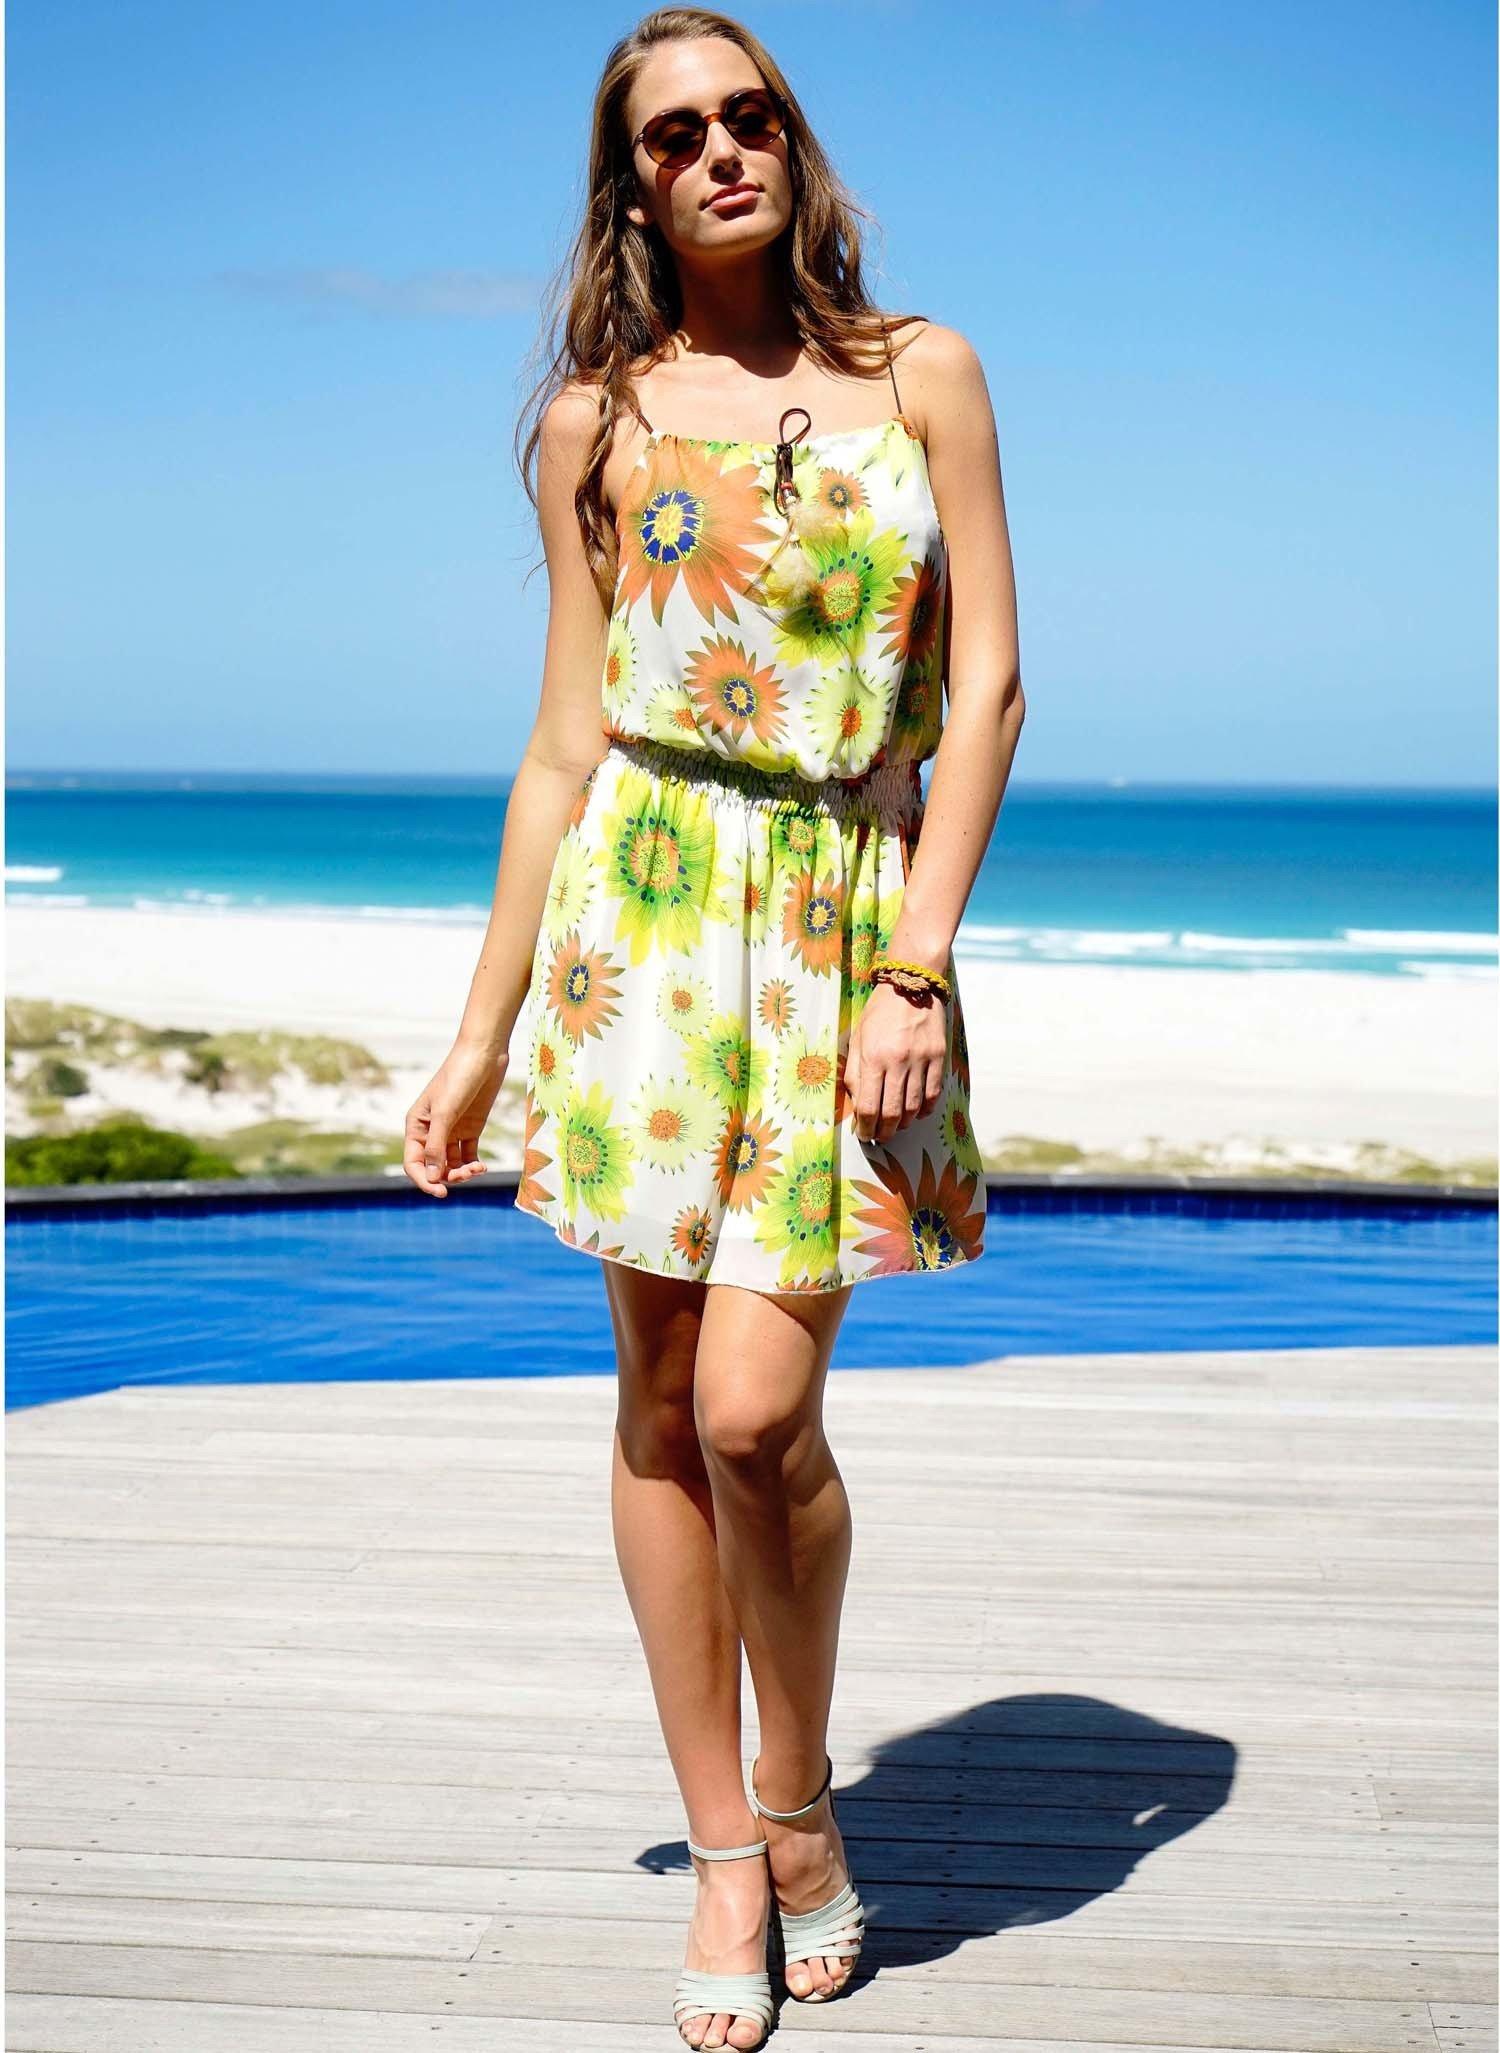 D-Sommer-Kleid,Blumen rosa/gr. L 058 - 1 - Ronja.ch